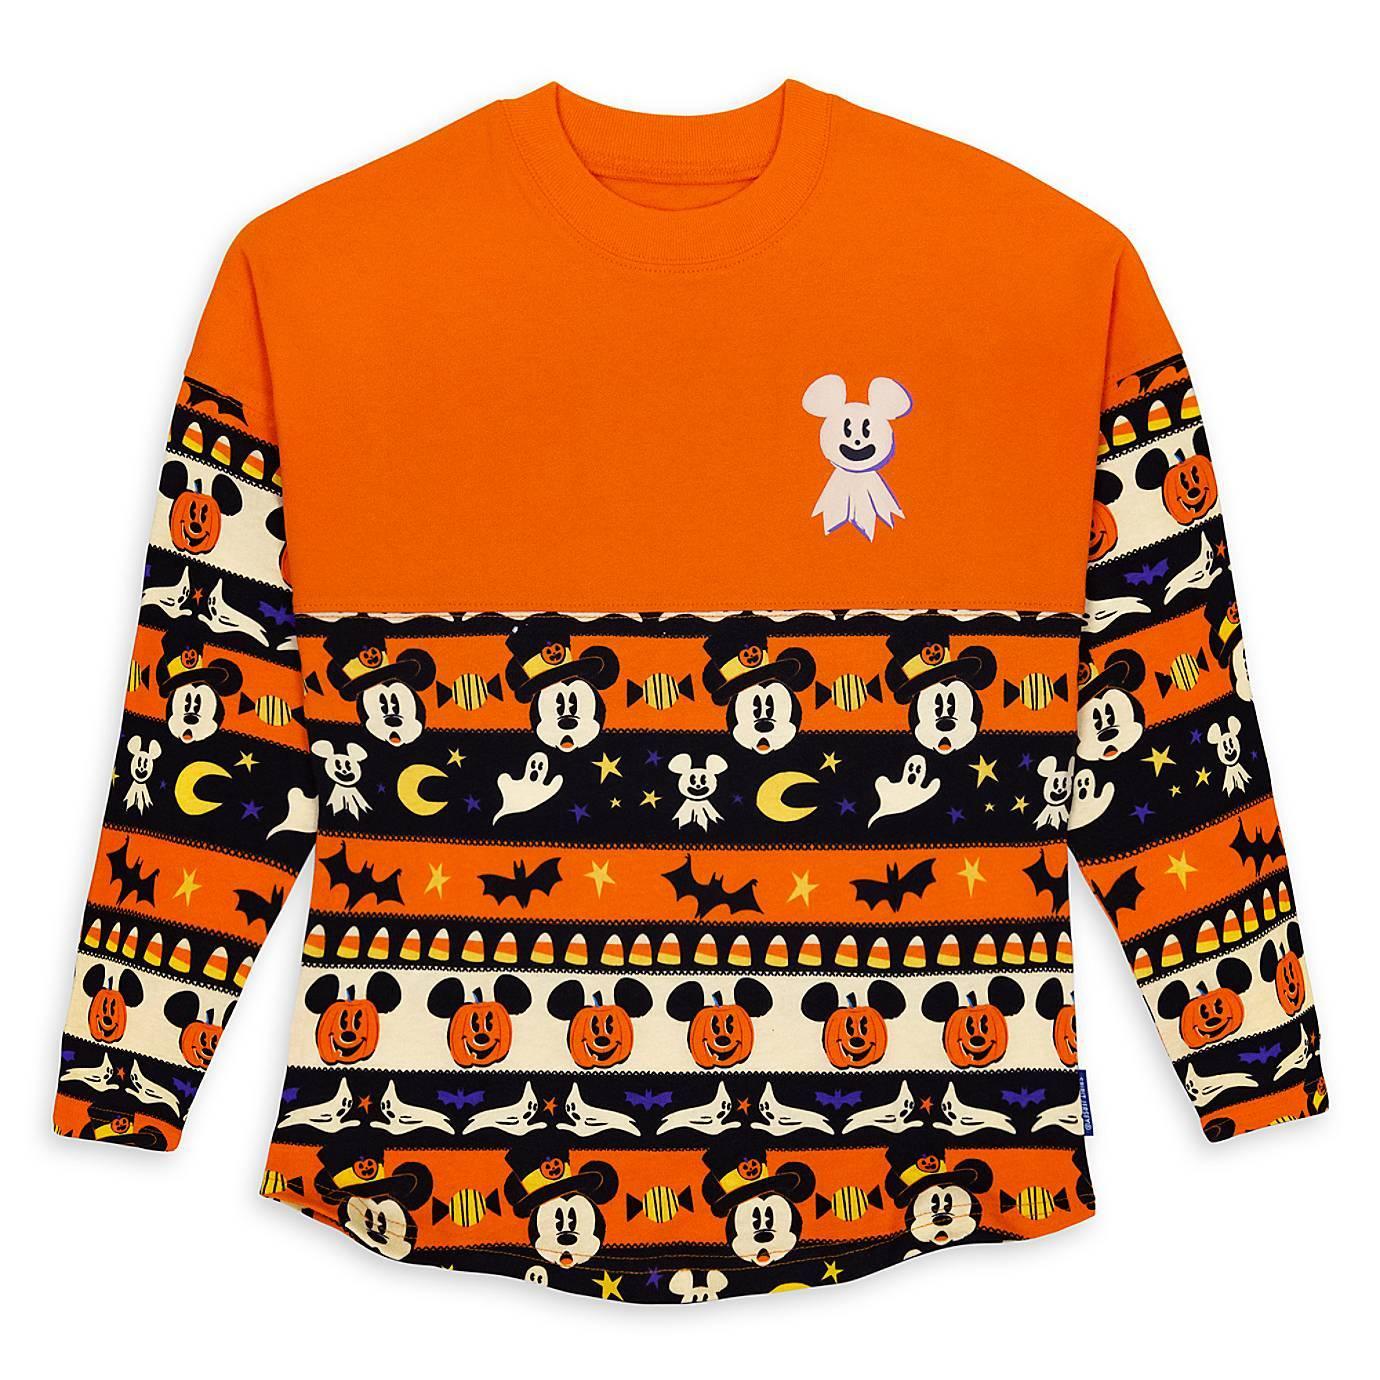 Mickey Face Black Tee Shirt 2020 Halloween Disney's Spooky Collection of 2020 Halloween Merchandise has